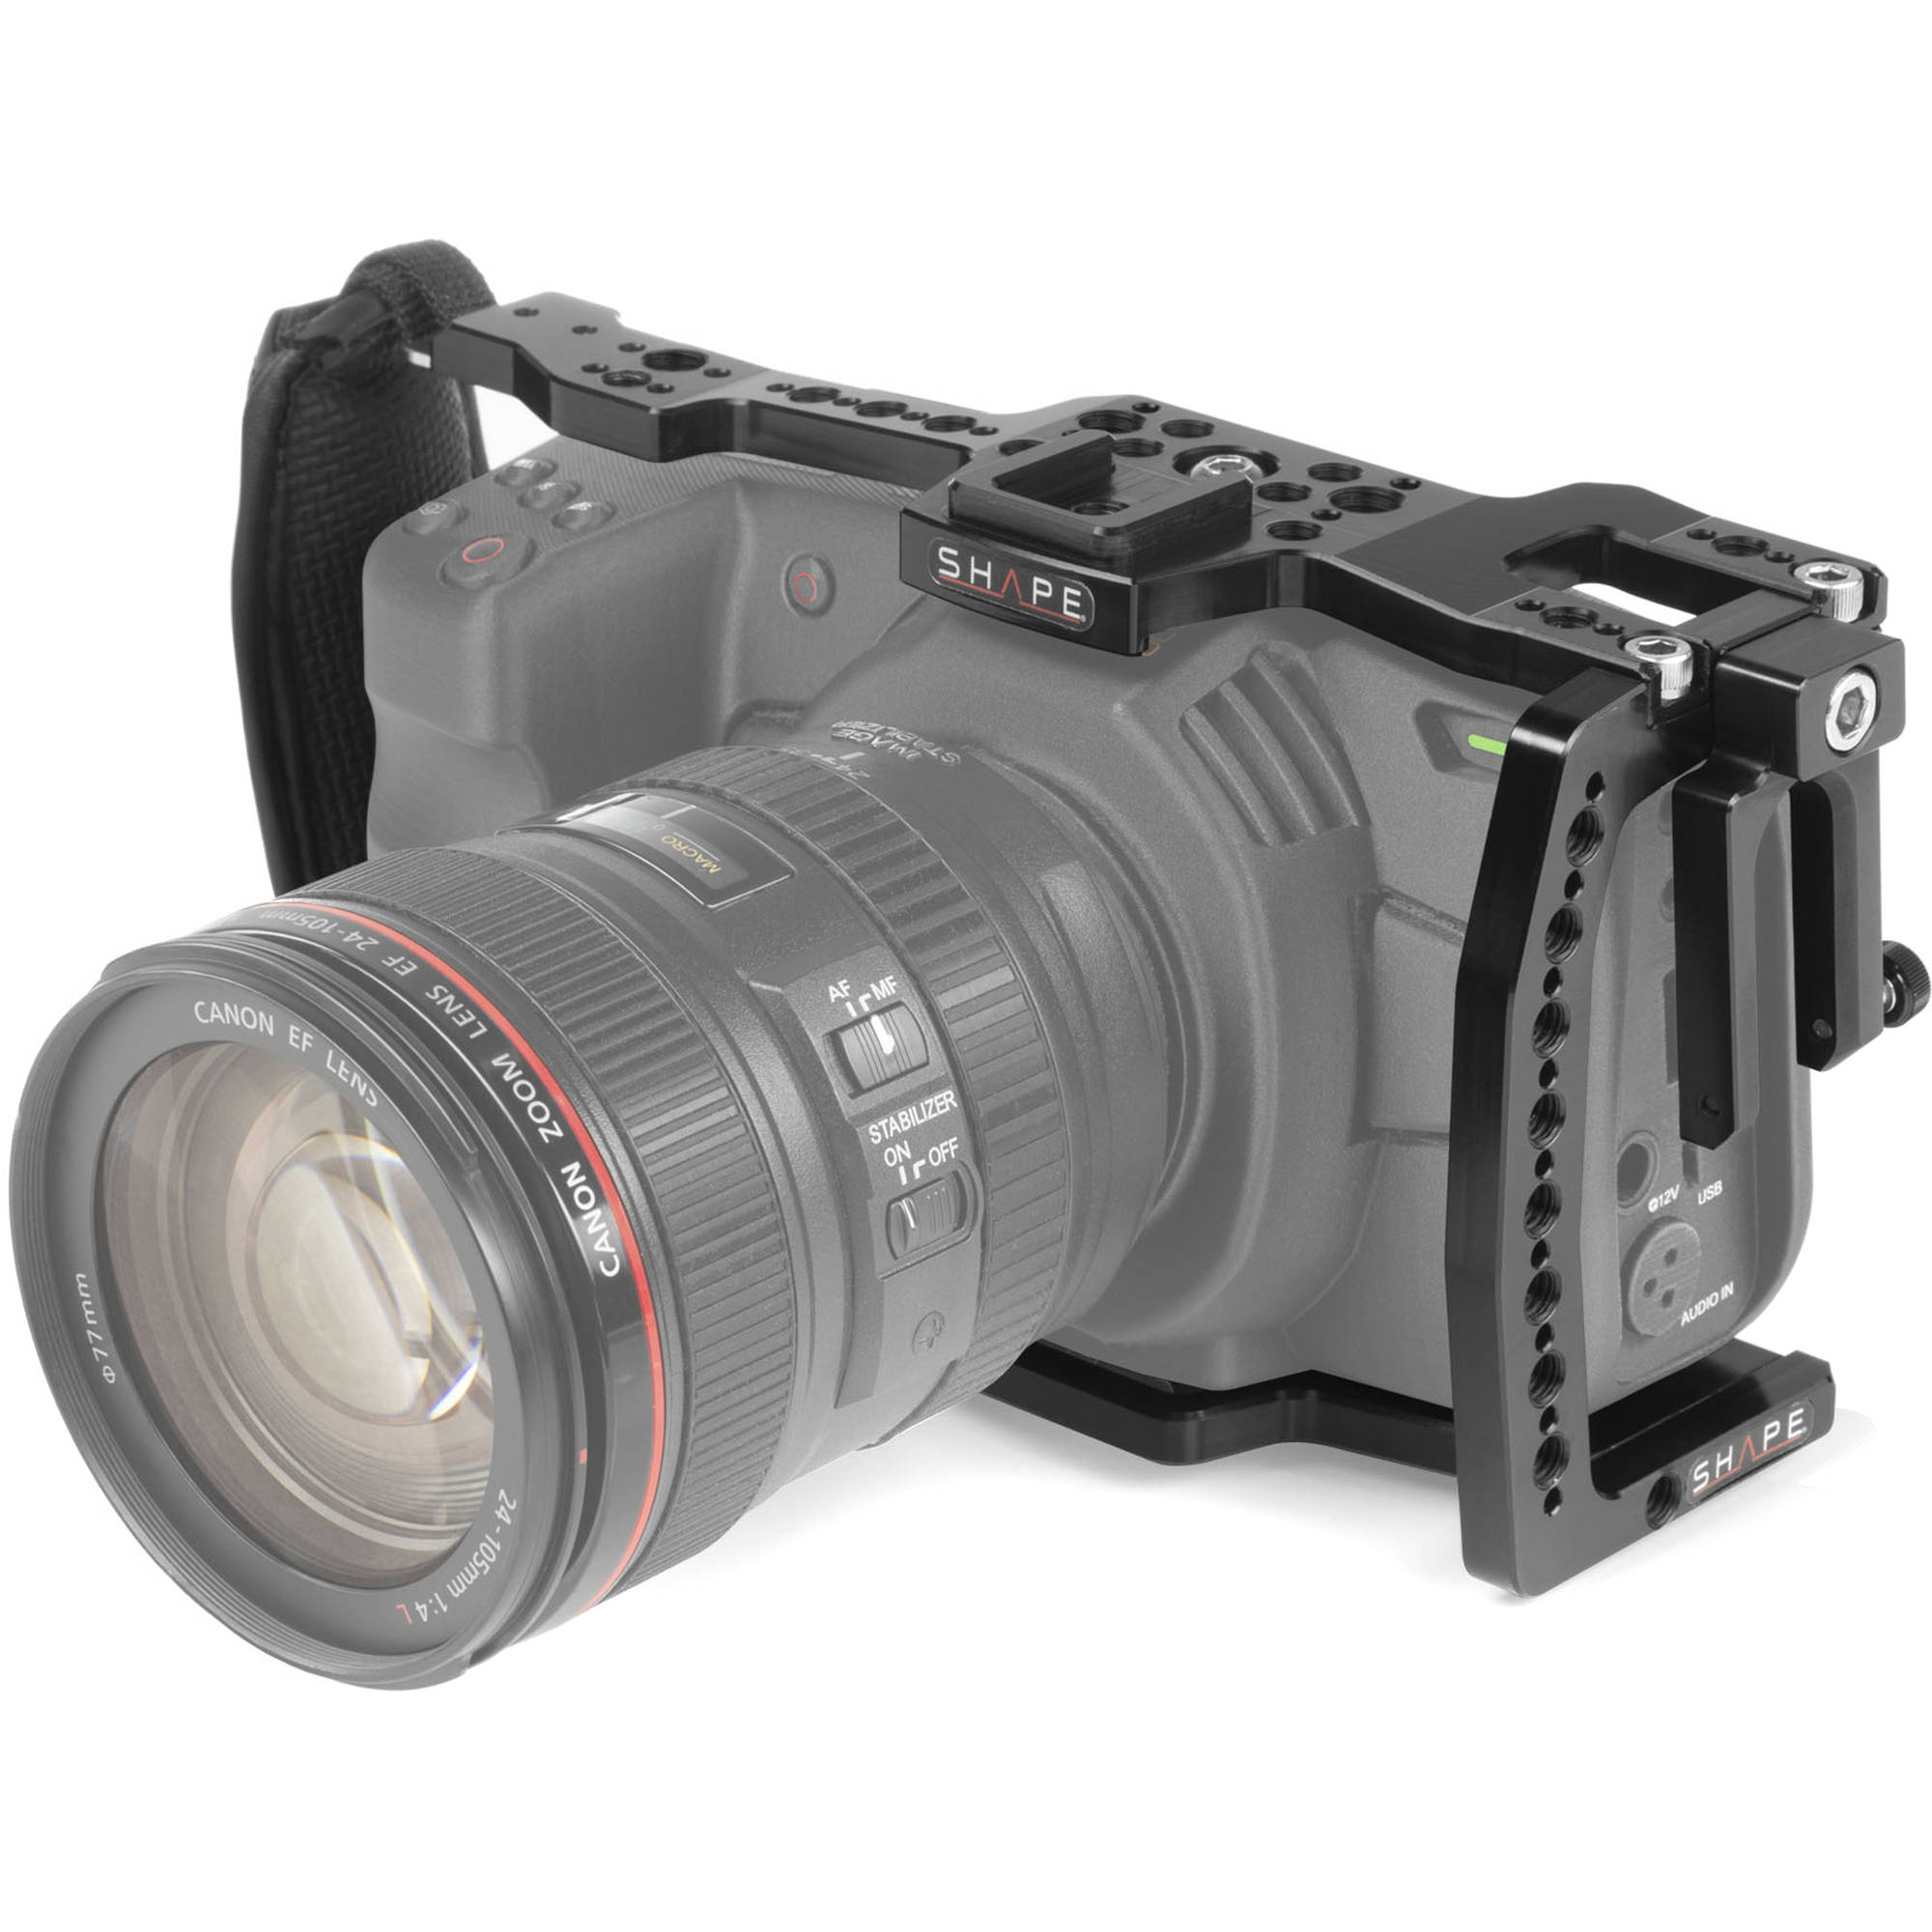 Shape Cage For Blackmagic Pocket Cinema Camera 6k And 4k Cbm4k